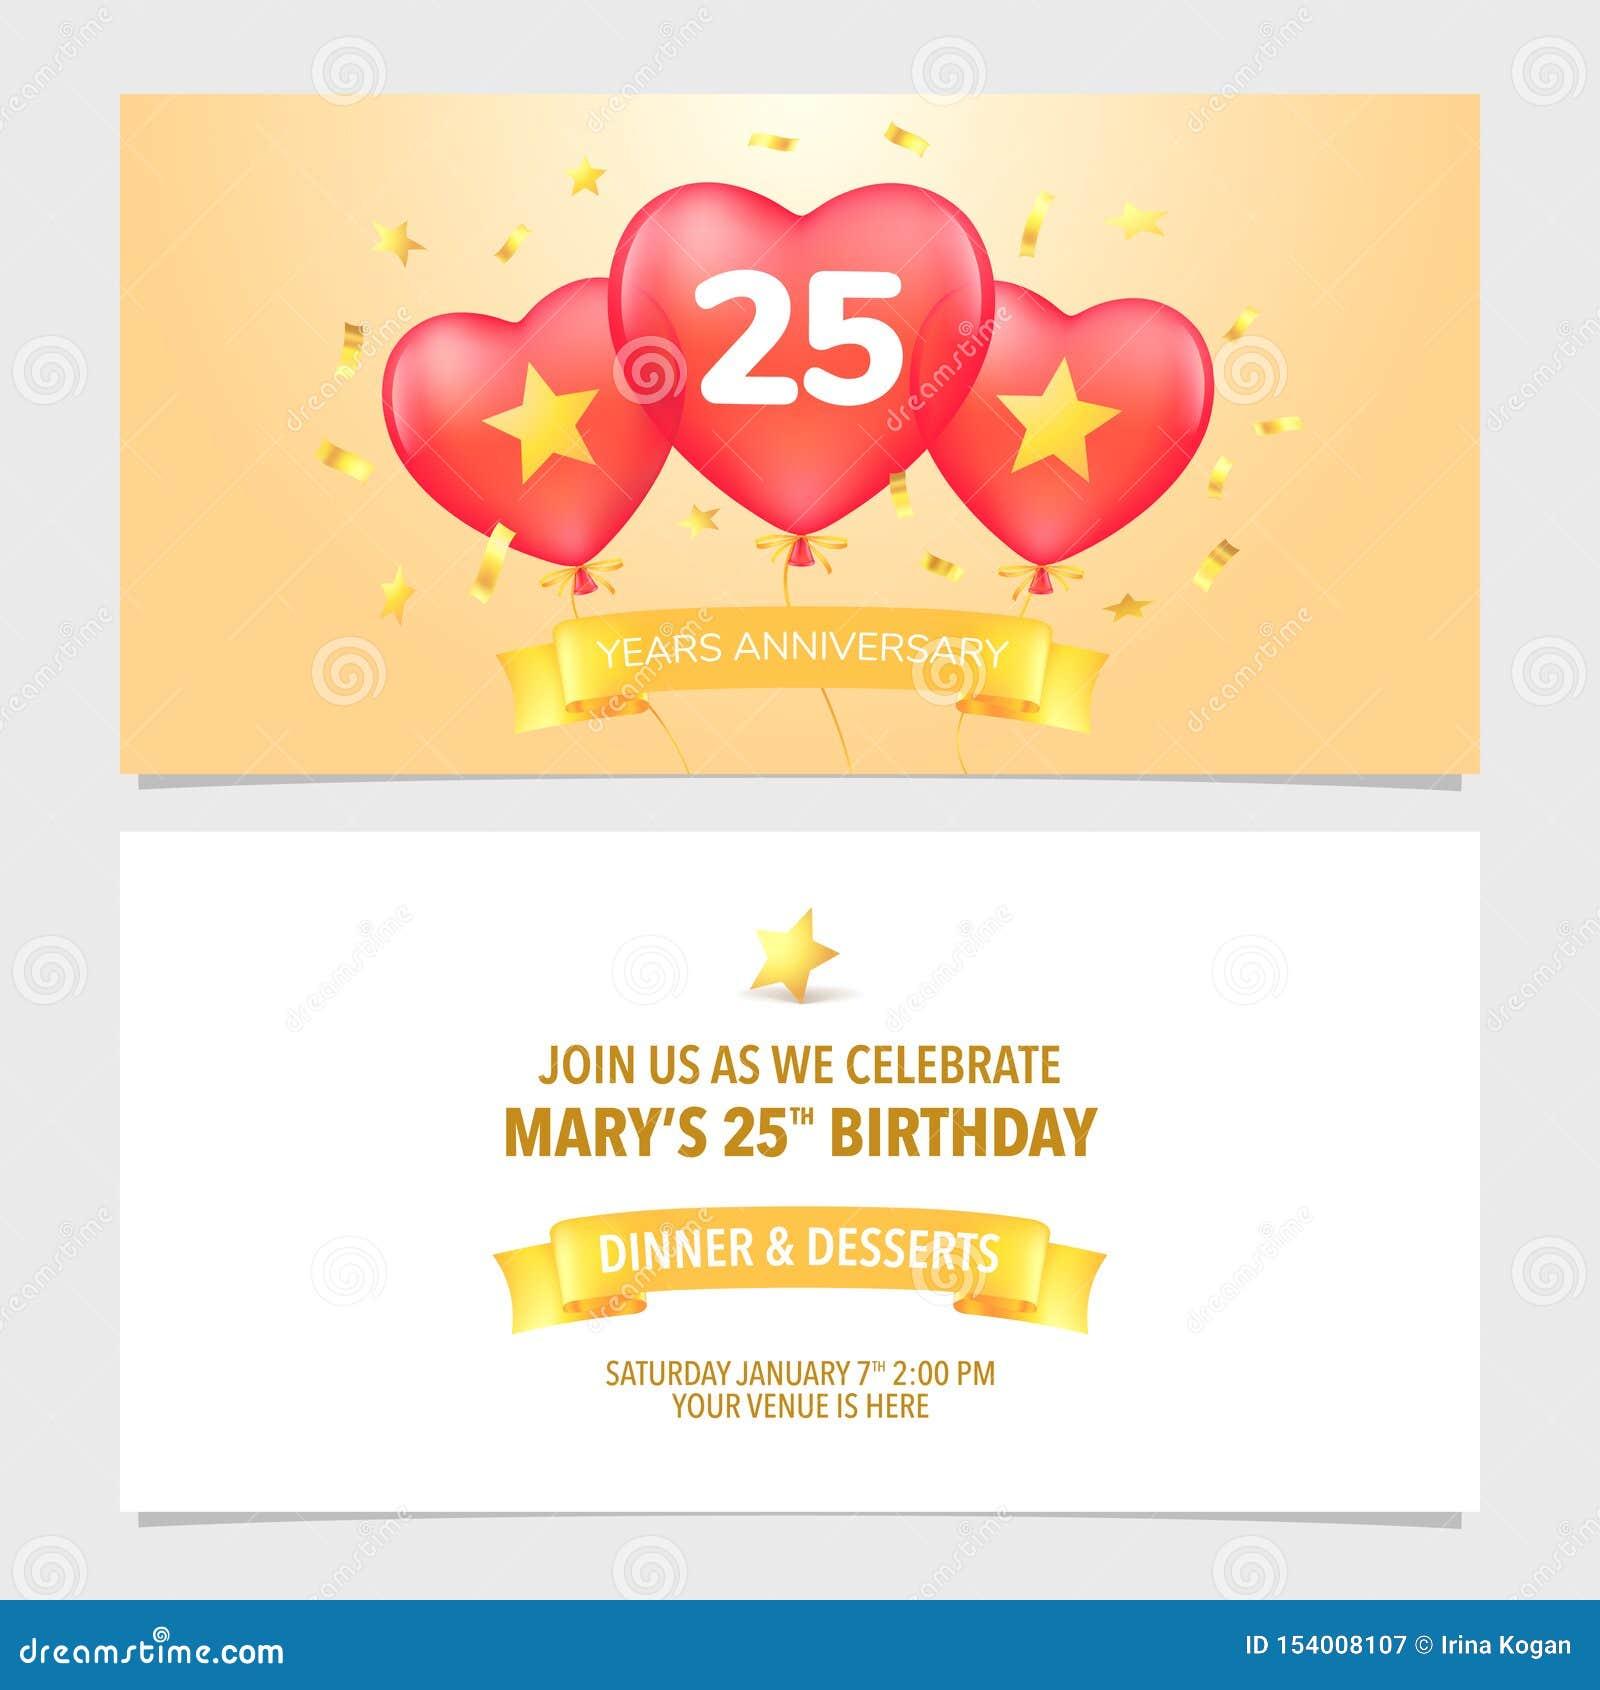 25 Years Anniversary Invitation Vector Illustration Design